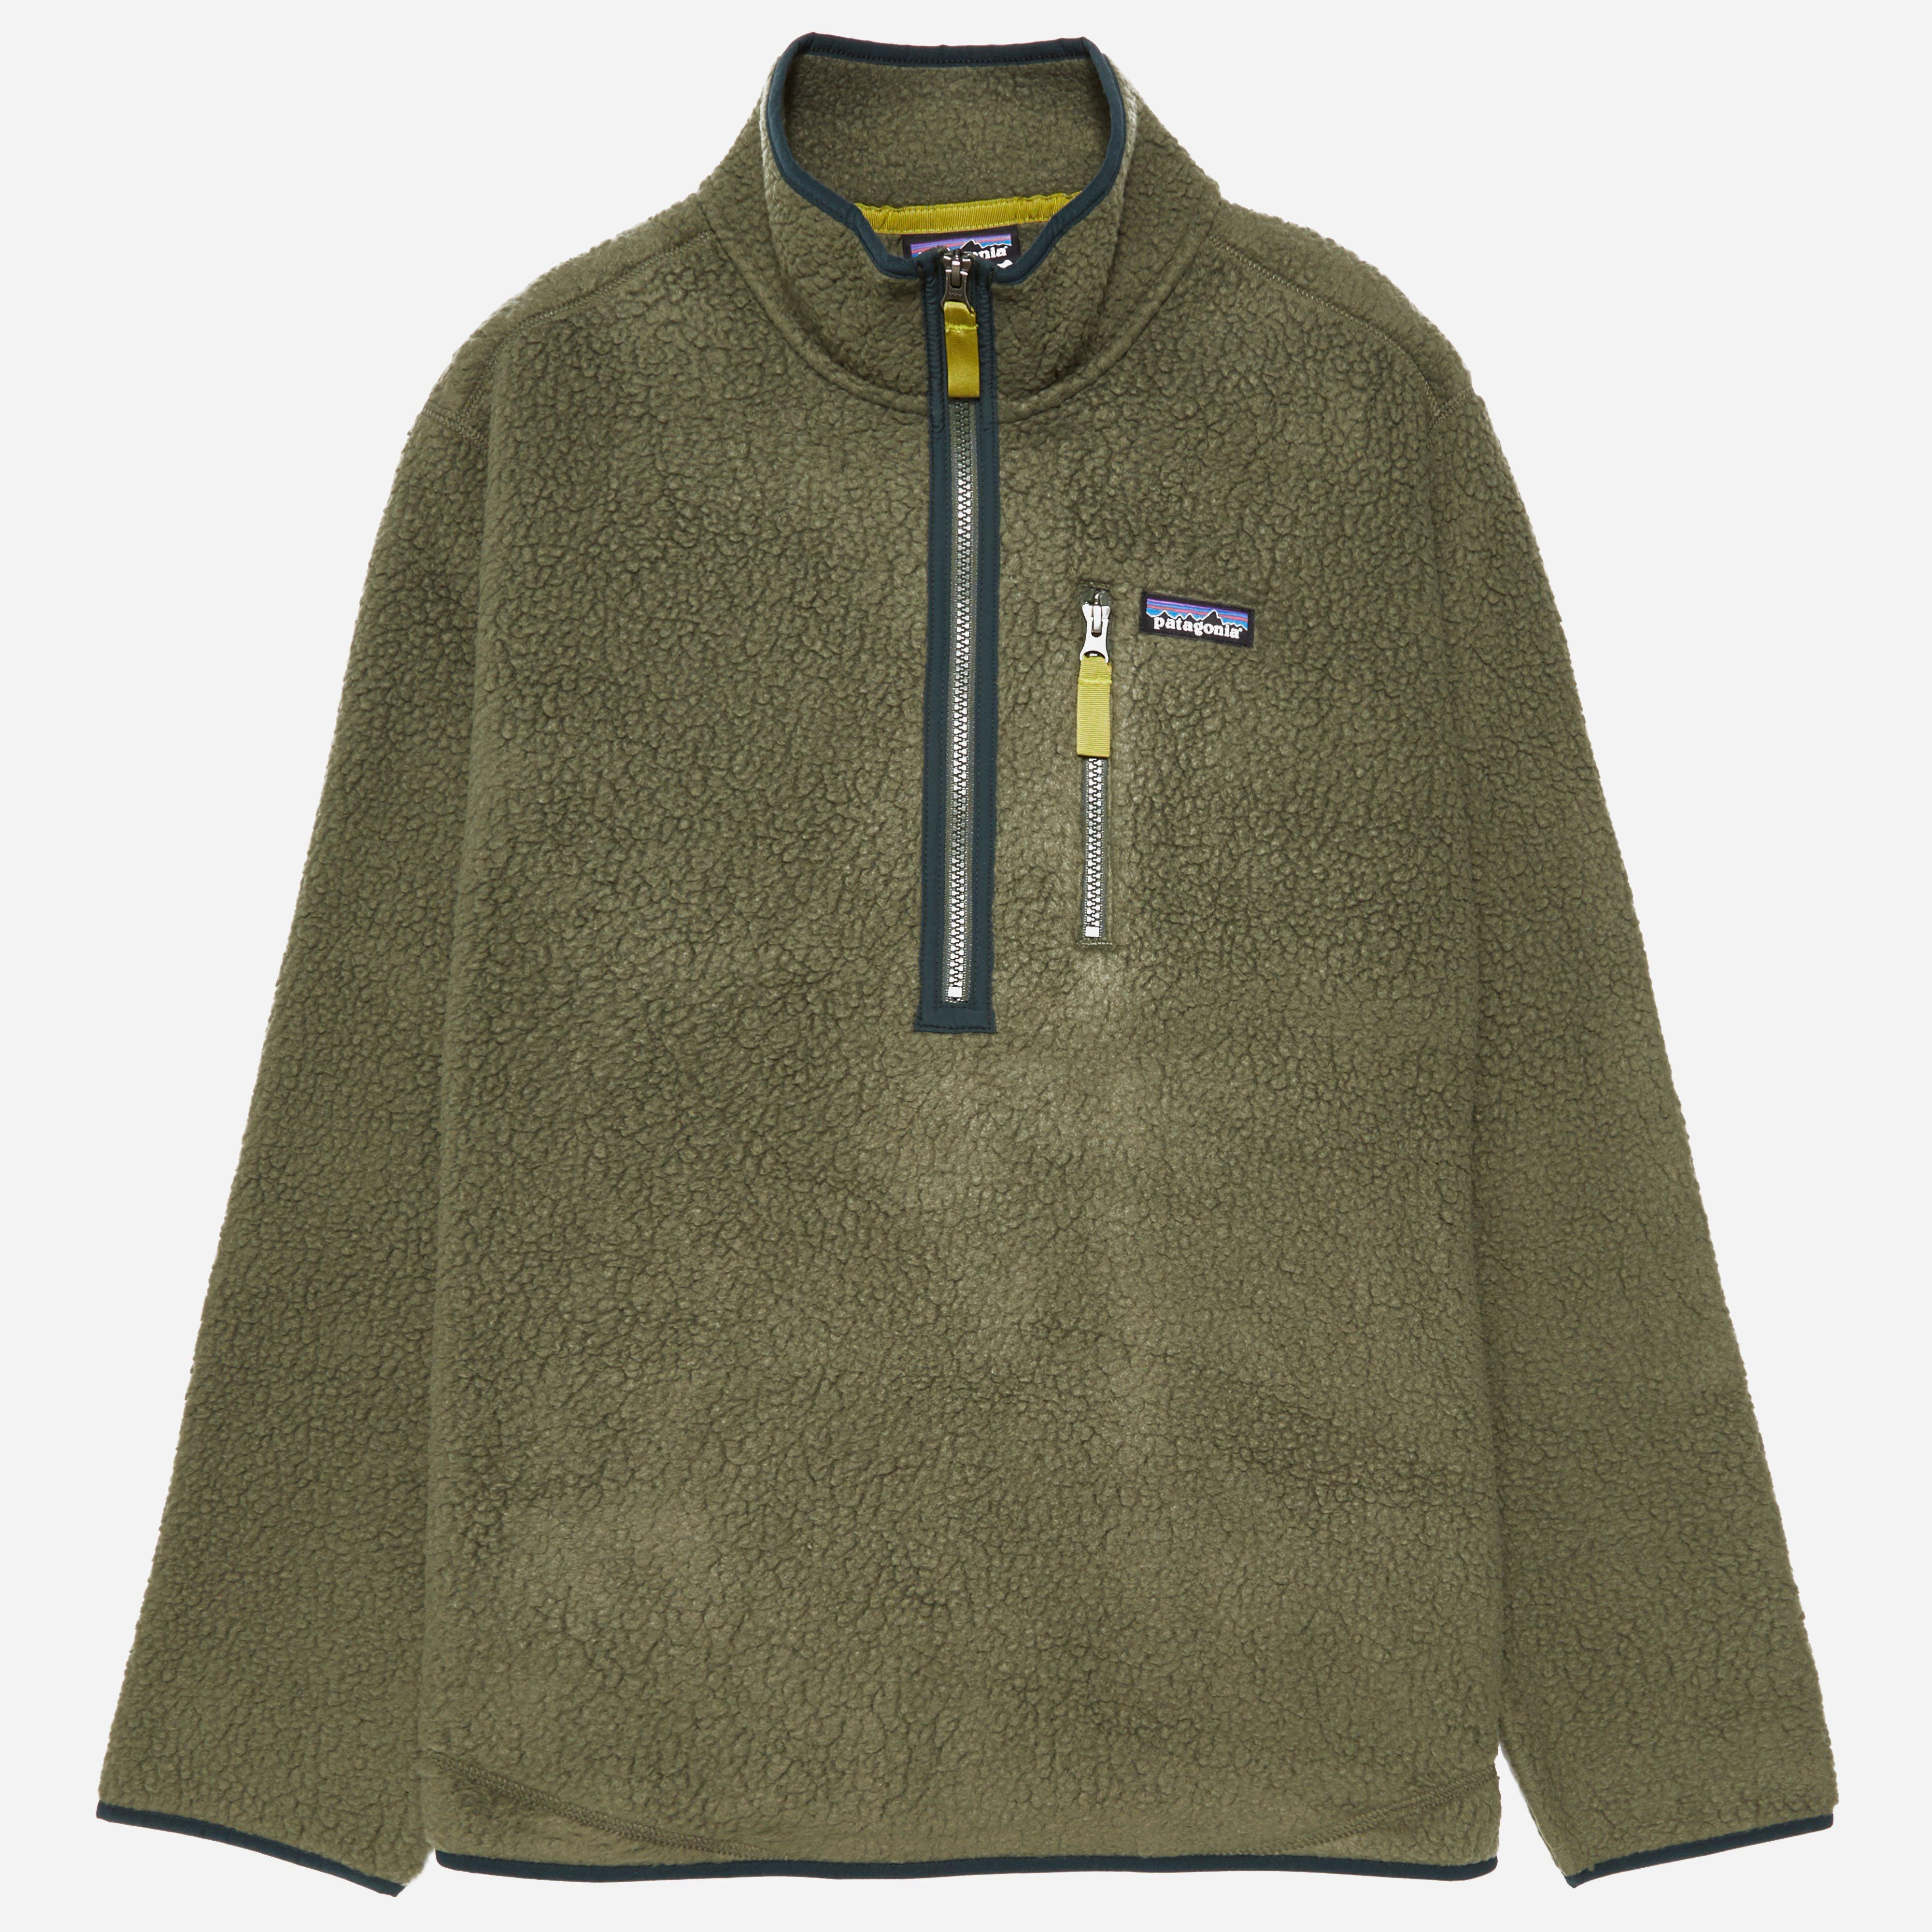 Patagonia Retro Pile Fleece Pullover Jacket